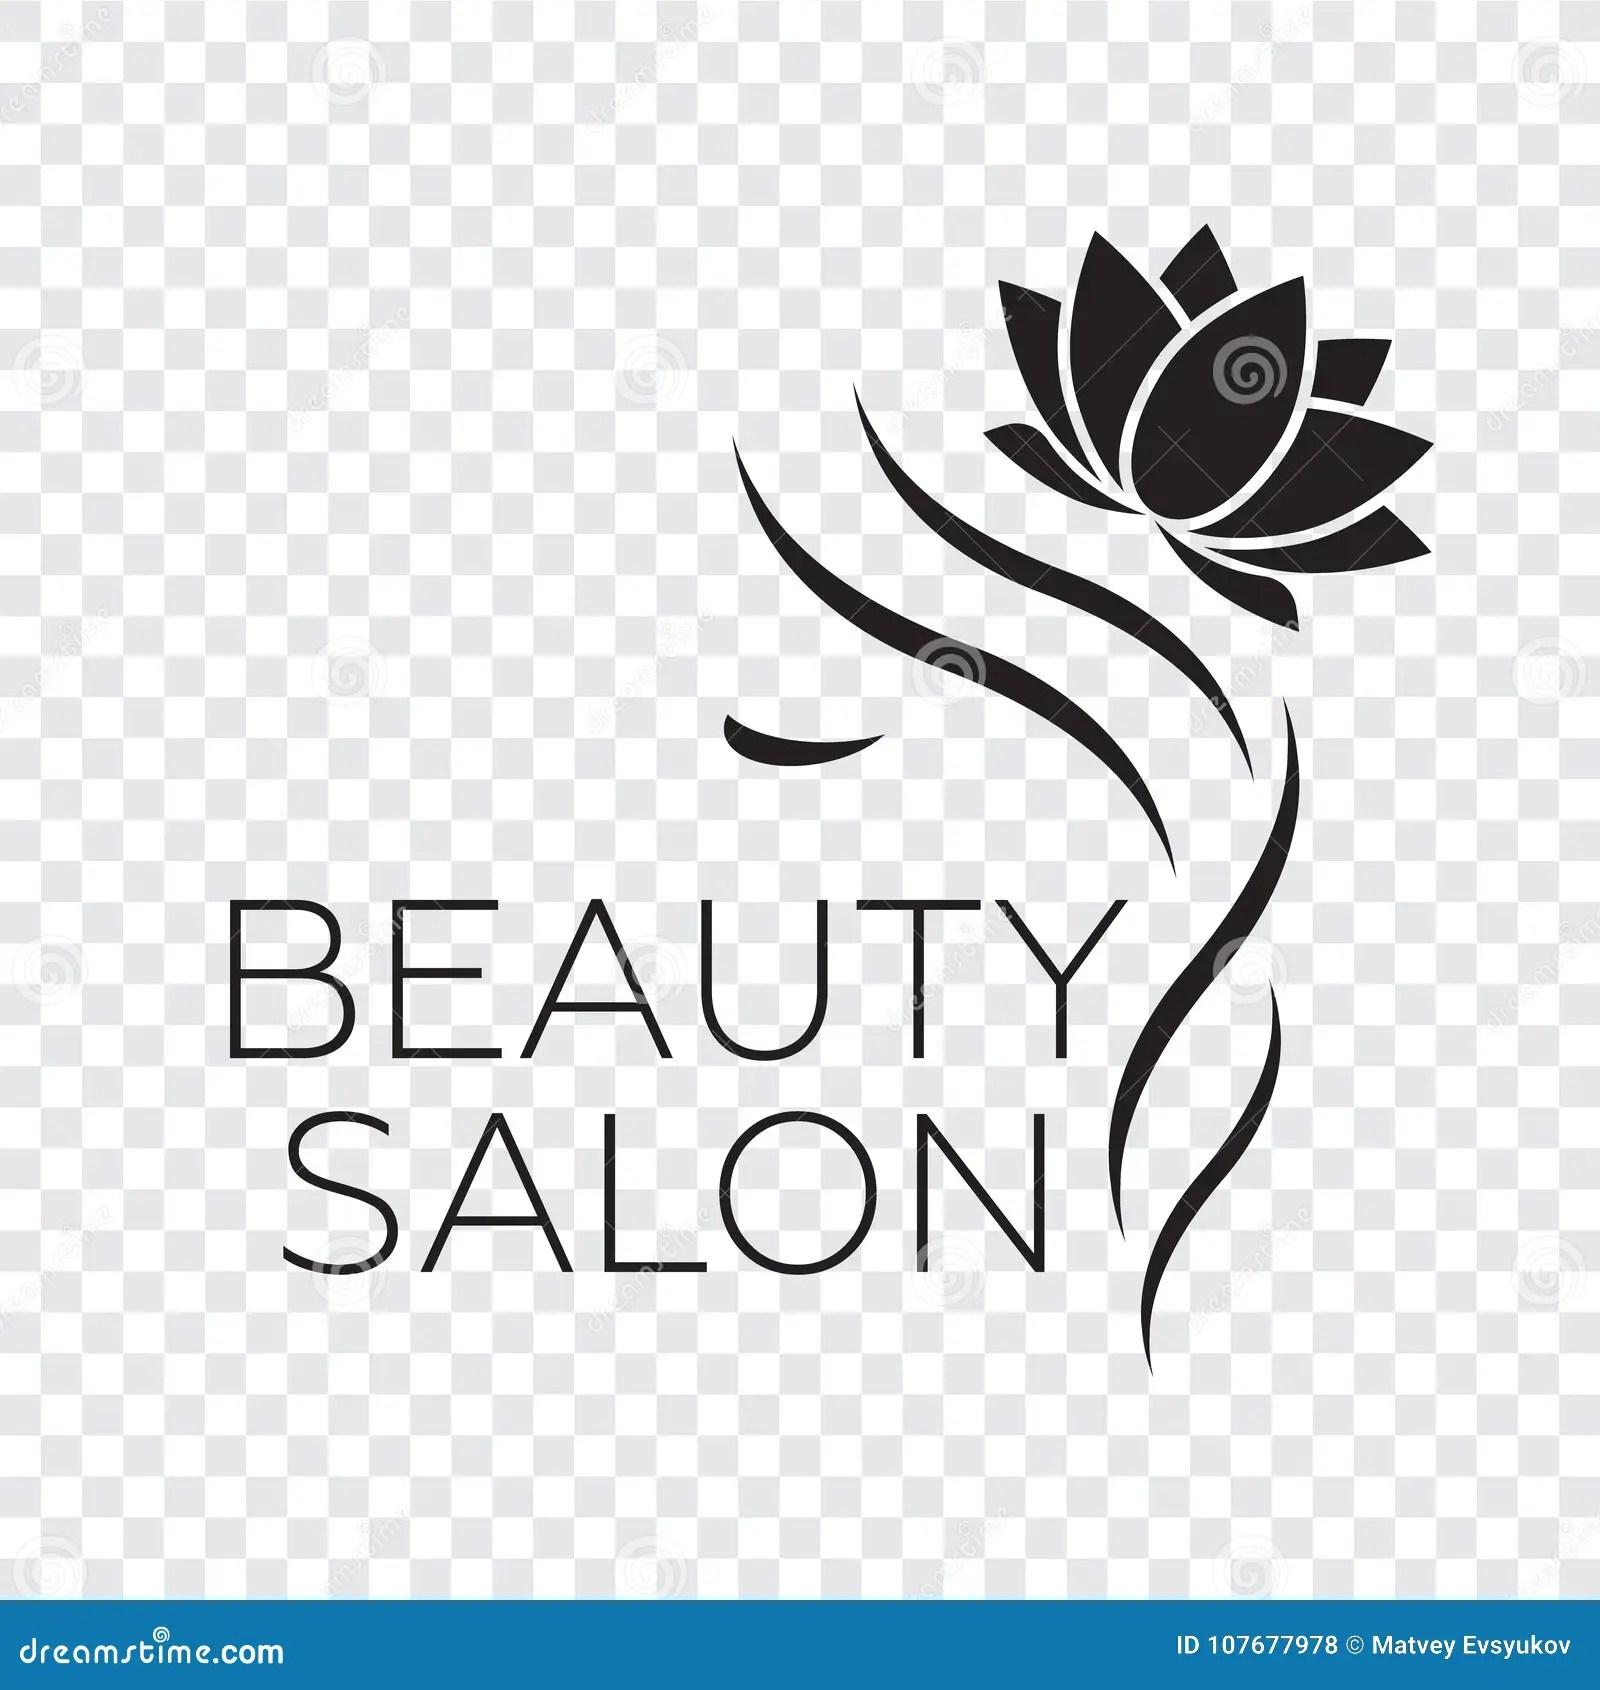 Logo Template For Hair Salon, Beauty Salon, Cosmetic